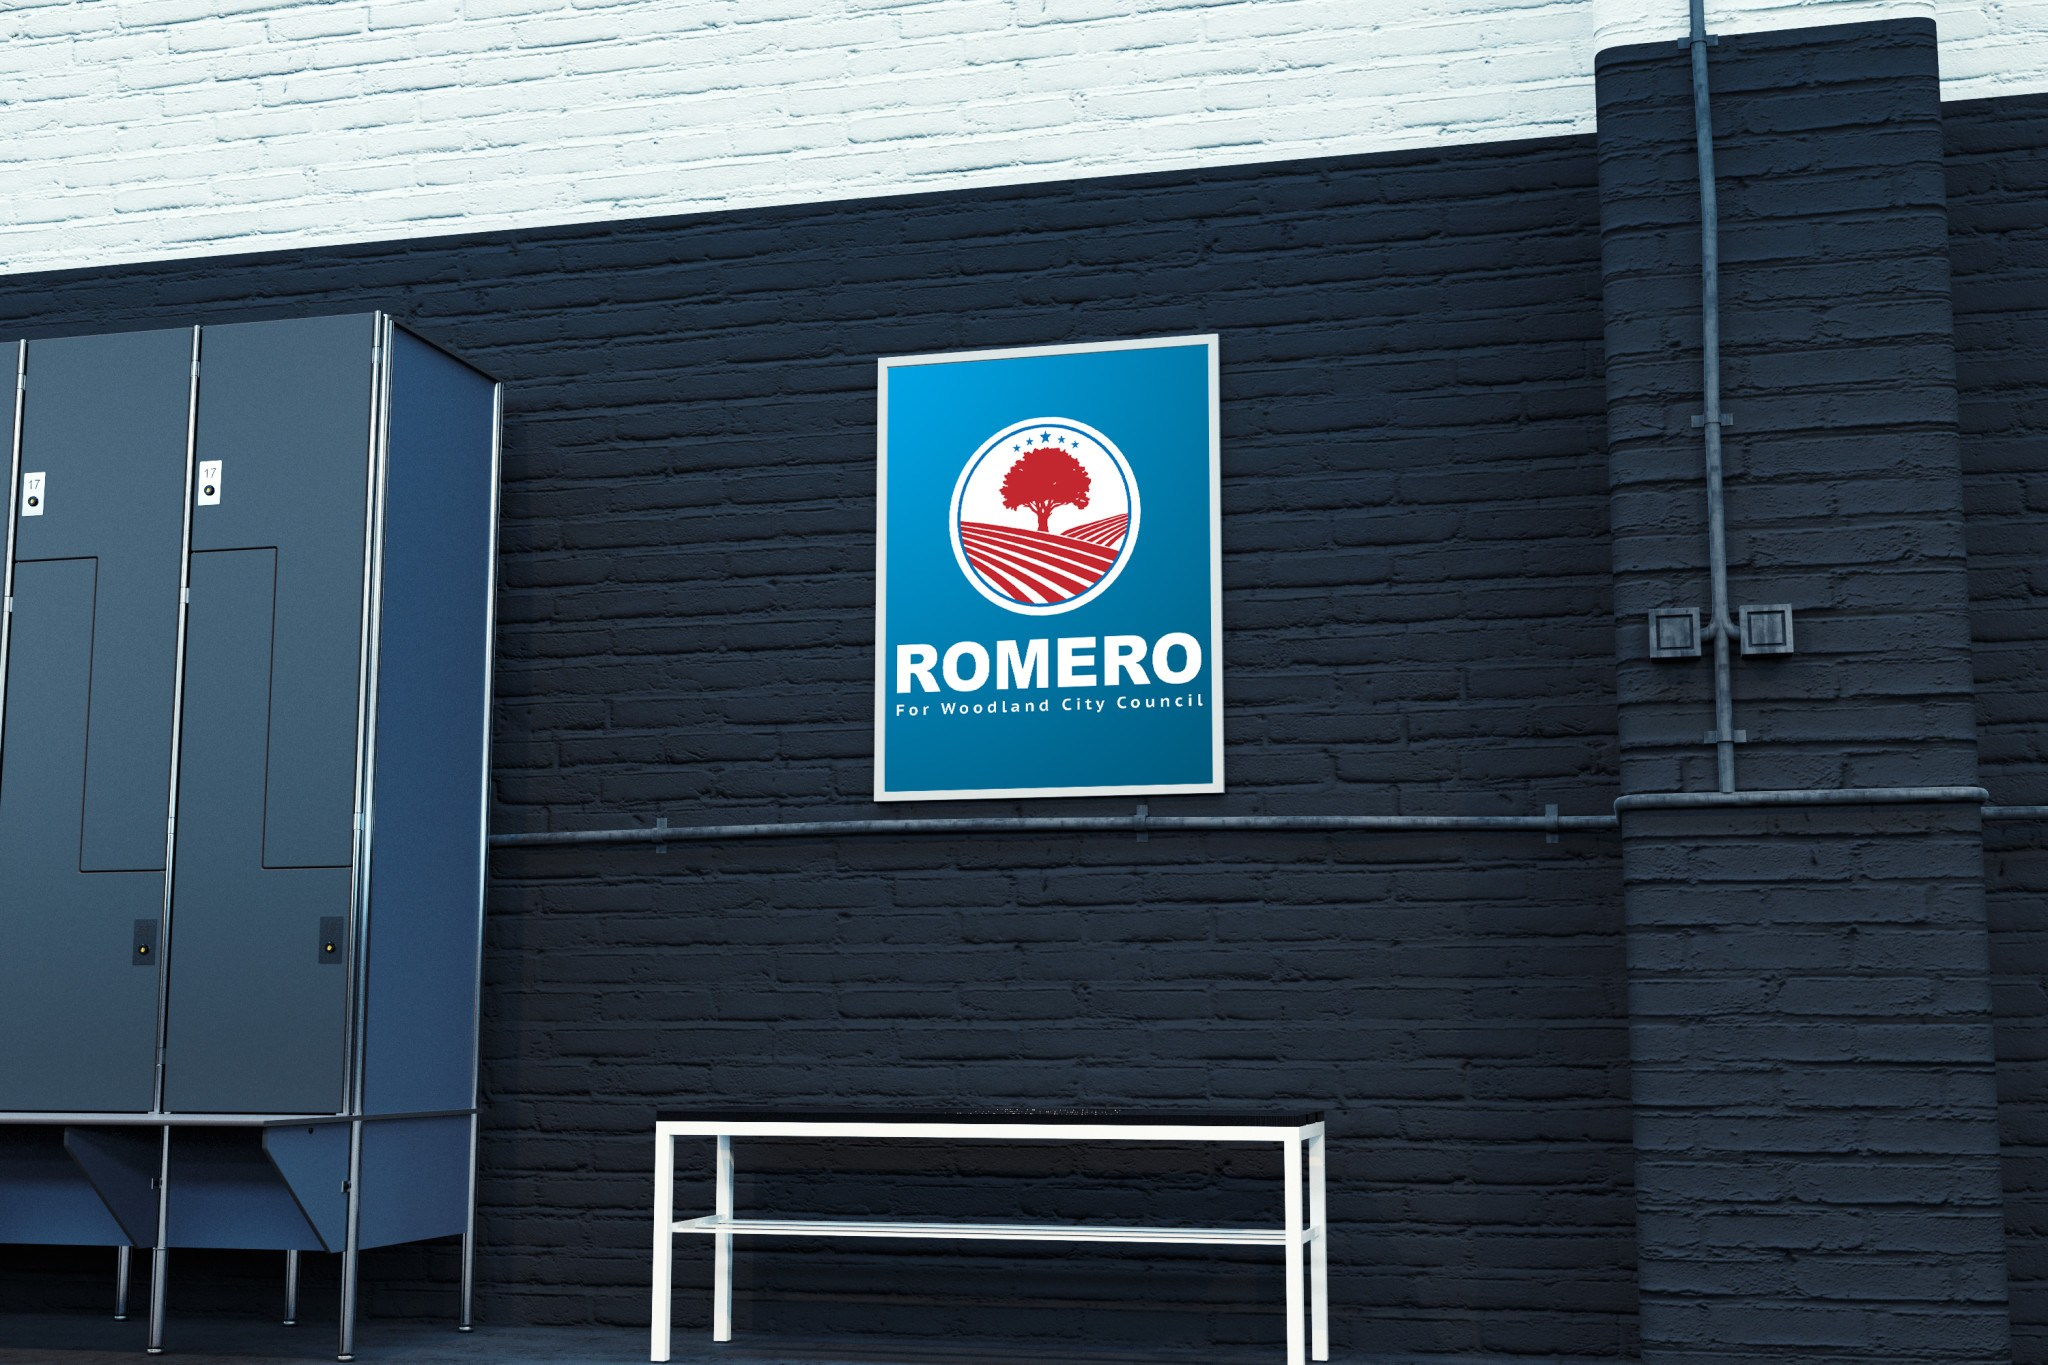 Romero_1